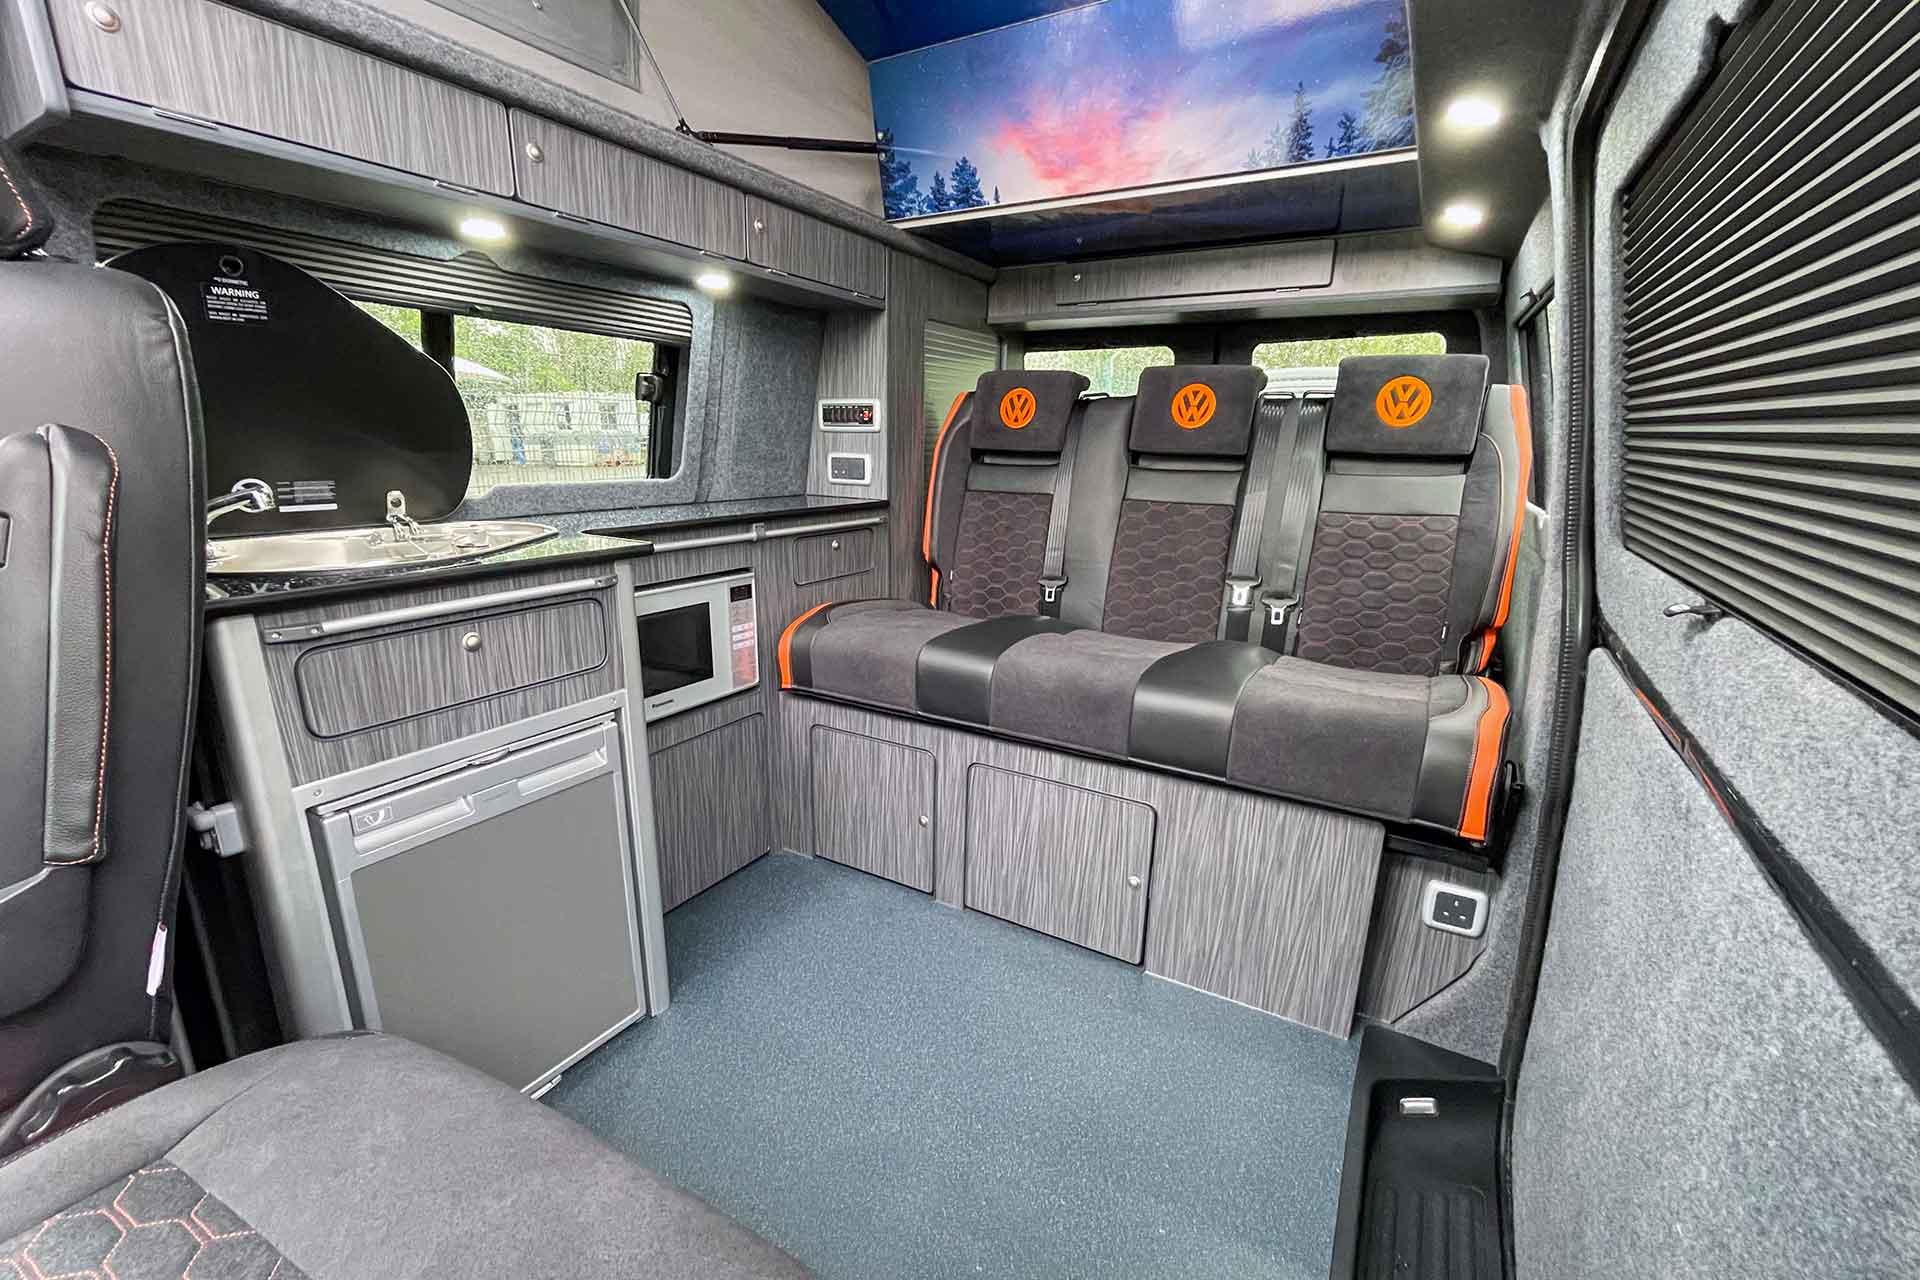 VW T6.1 Campervan Interior Conversion